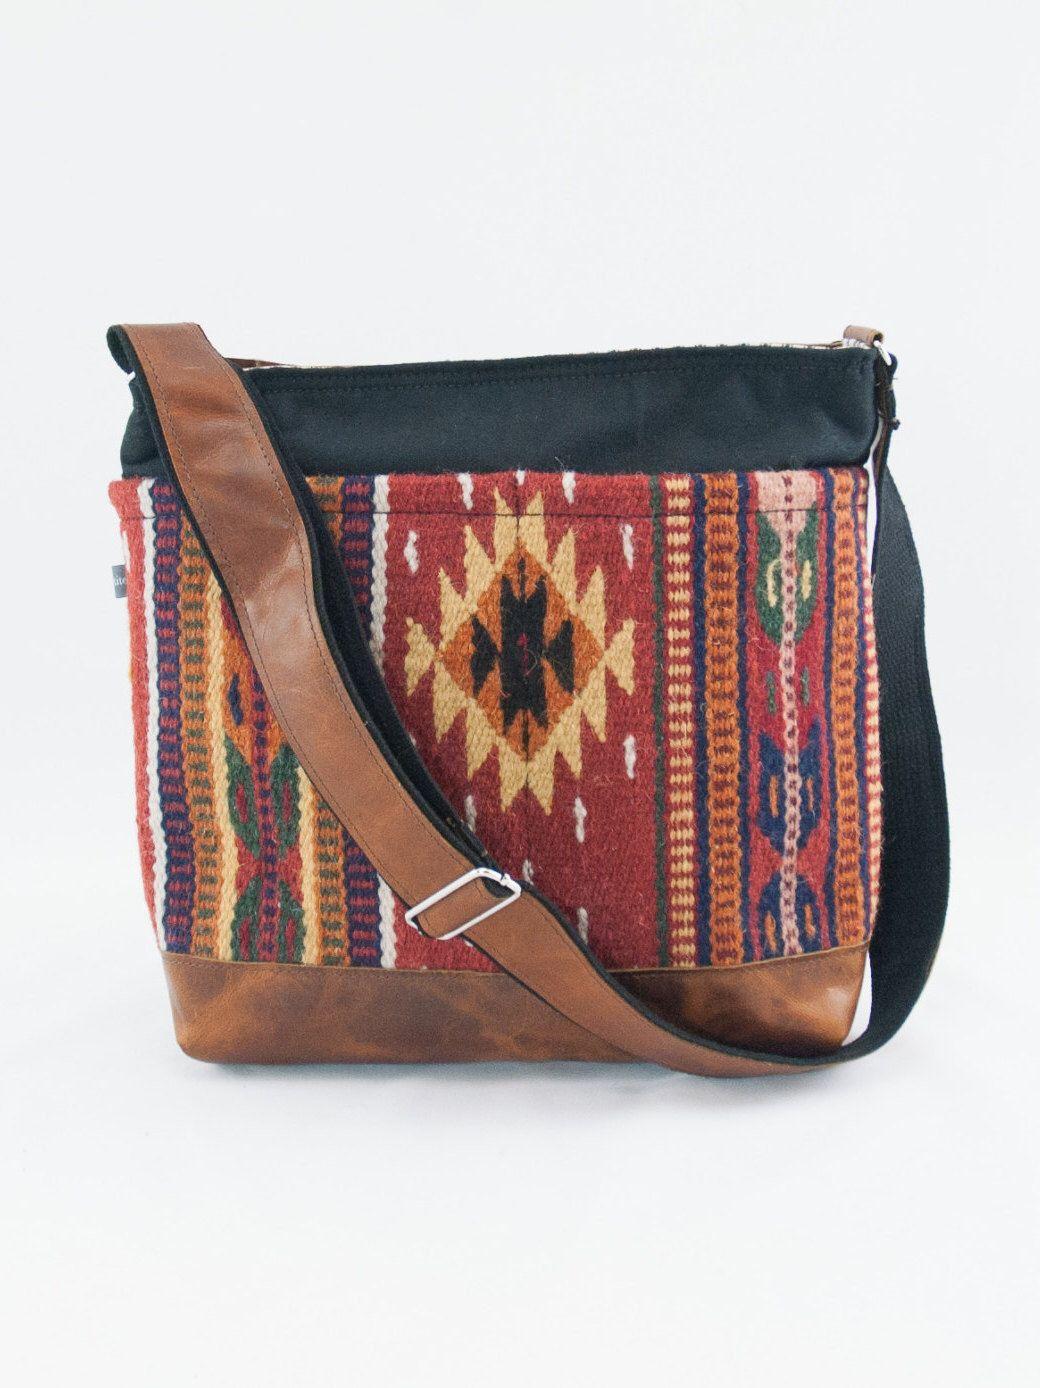 Small Batch Jane Crossbody Diaper Bag In Wool Saddle Blanket Orange By Ee On Etsy